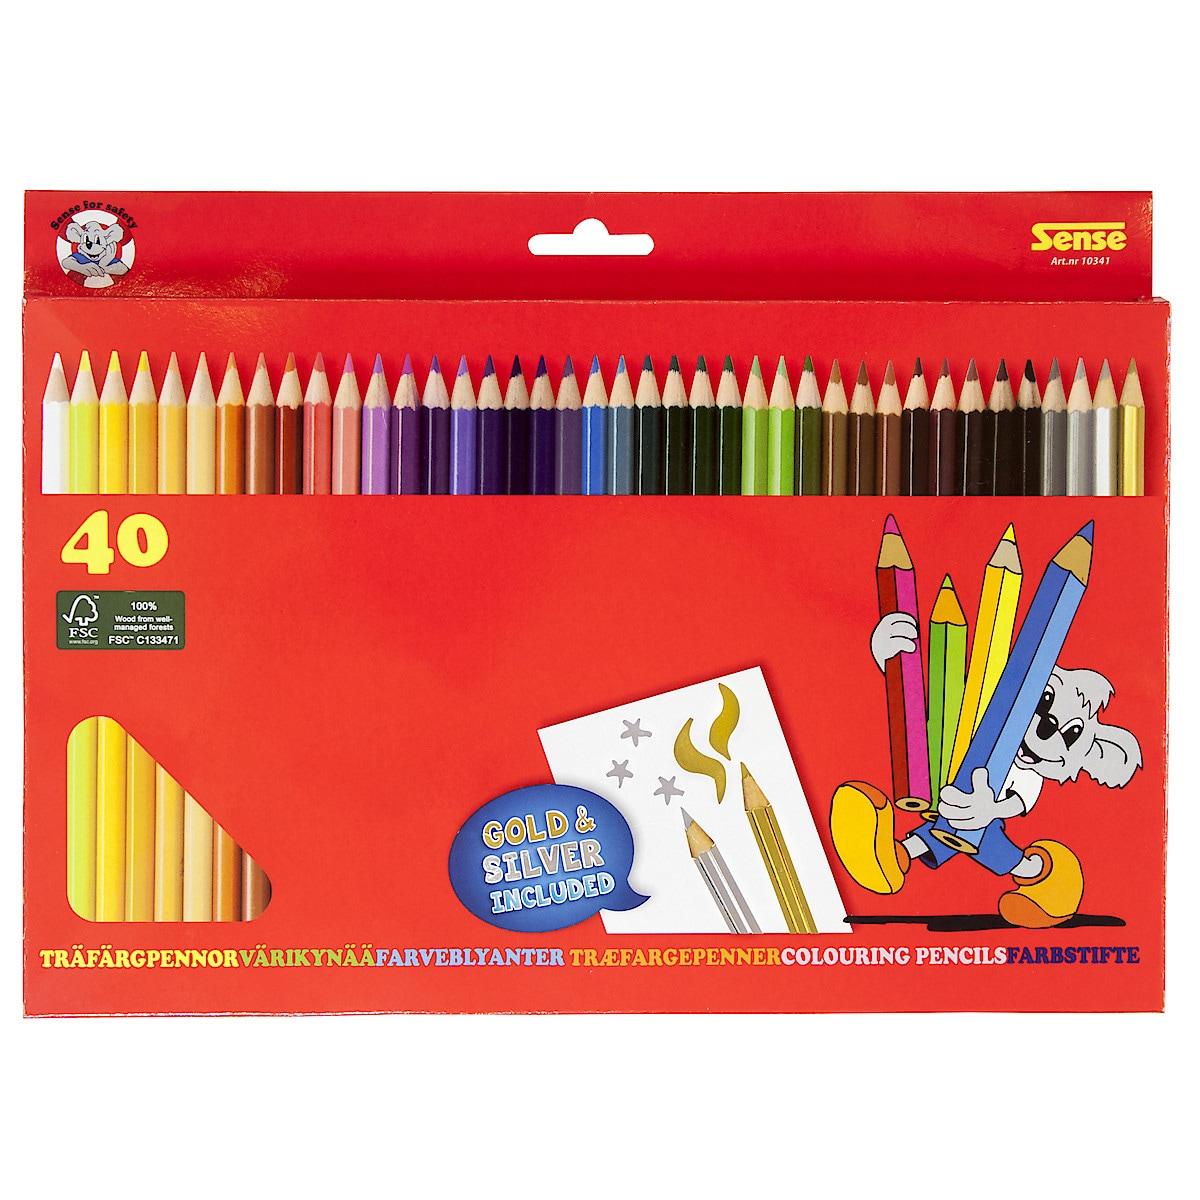 Set of 40 Sense Coloured Pencils